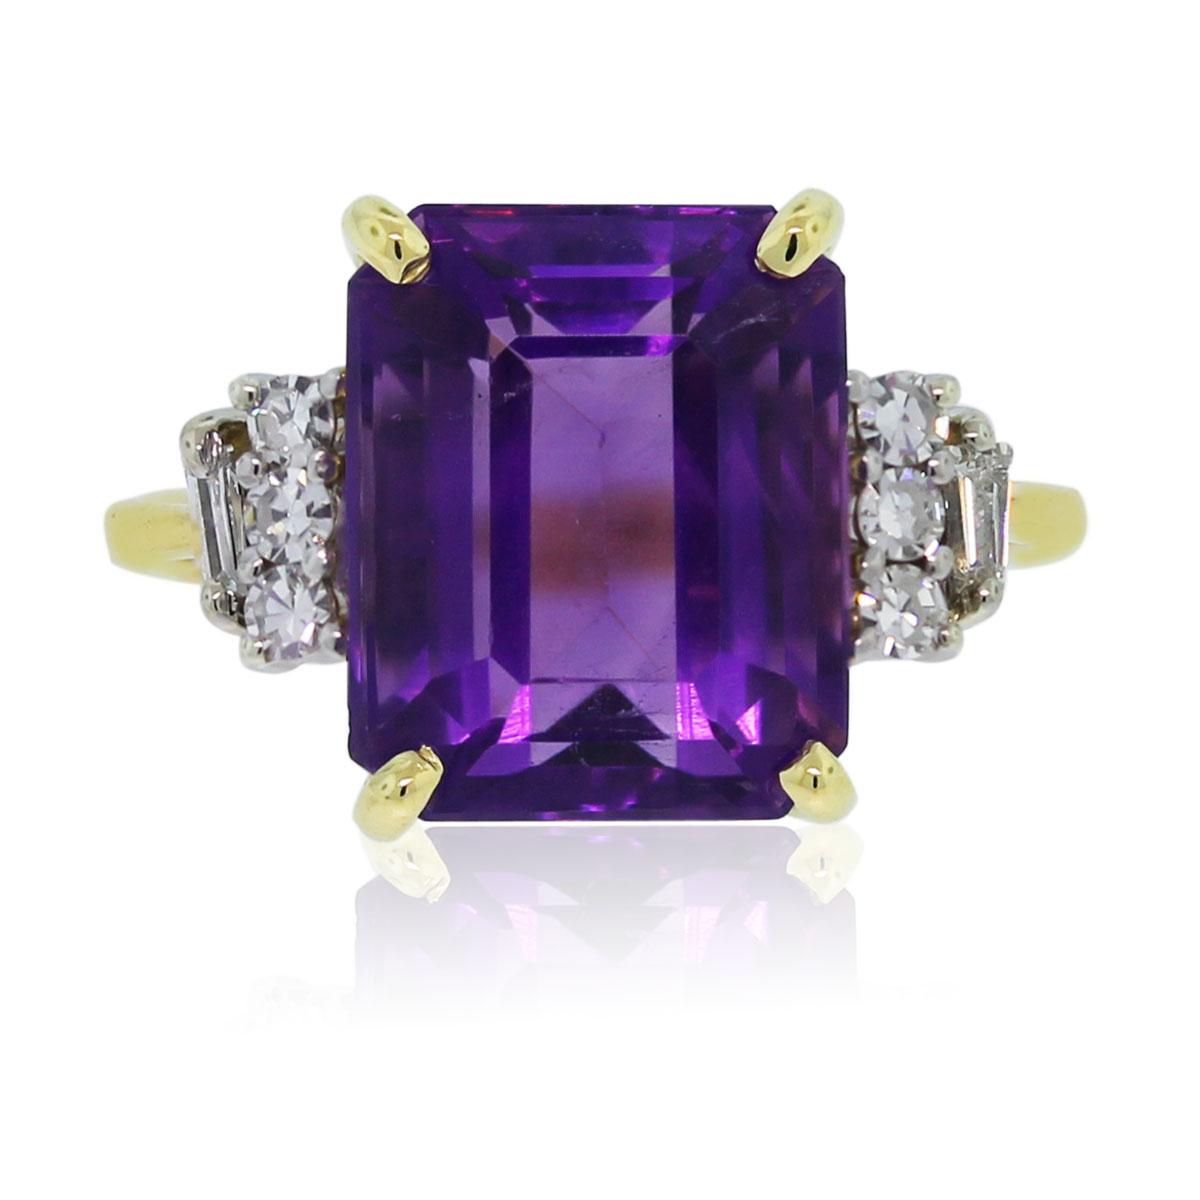 18k Yellow Gold Emerald Cut Amethyst Amp Diamond Ring